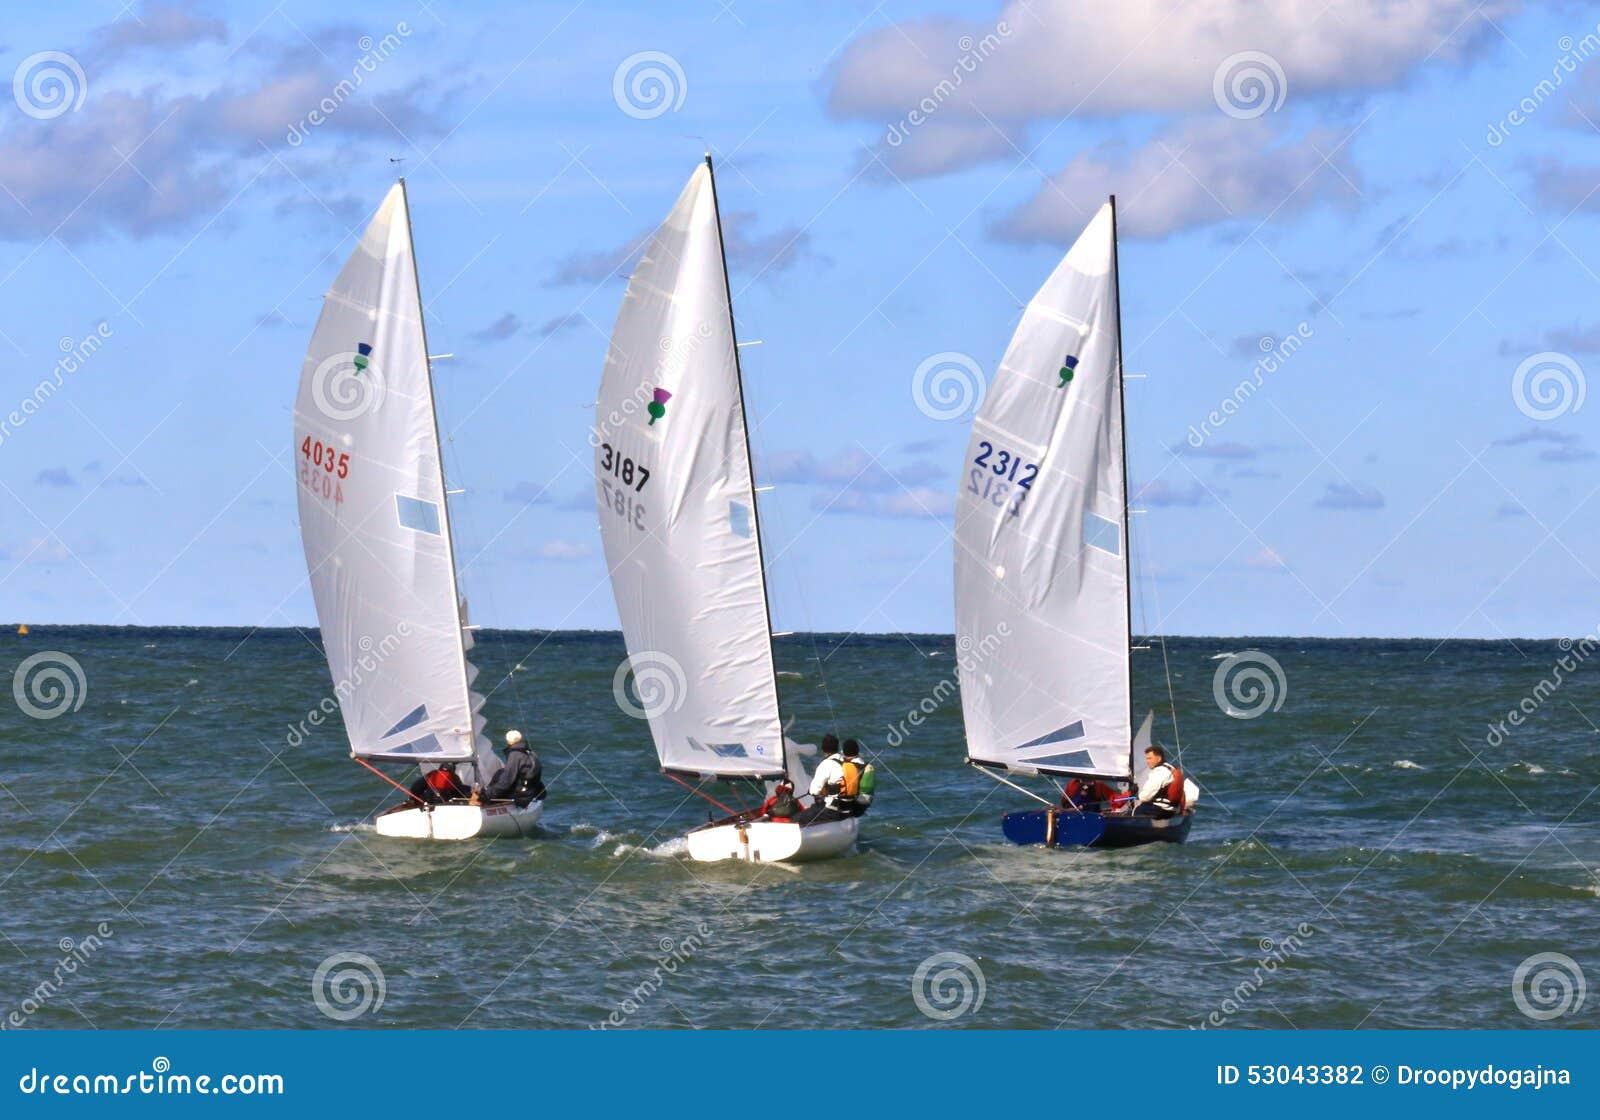 Sailing Regatta Race Action Editorial Photography Image